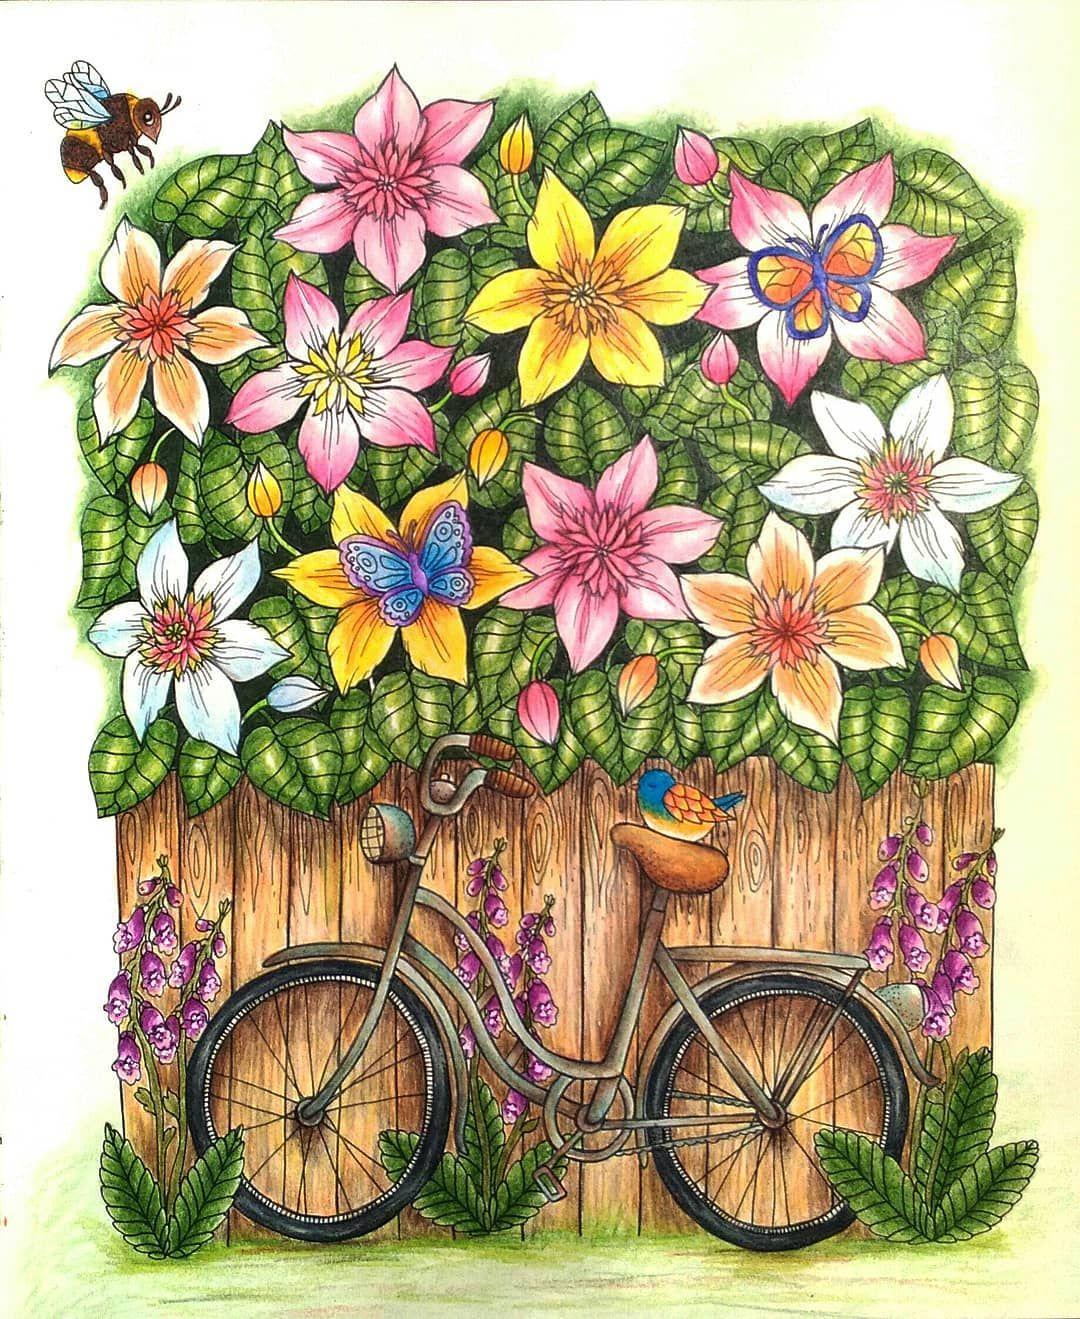 Missprefontaine On Instagram Twilightgarden Blomstermandala Mariatrolle Coloringbookforadults Coloring Colorings Coloringbook In 2020 Trolle Wenn Du Mal Buch